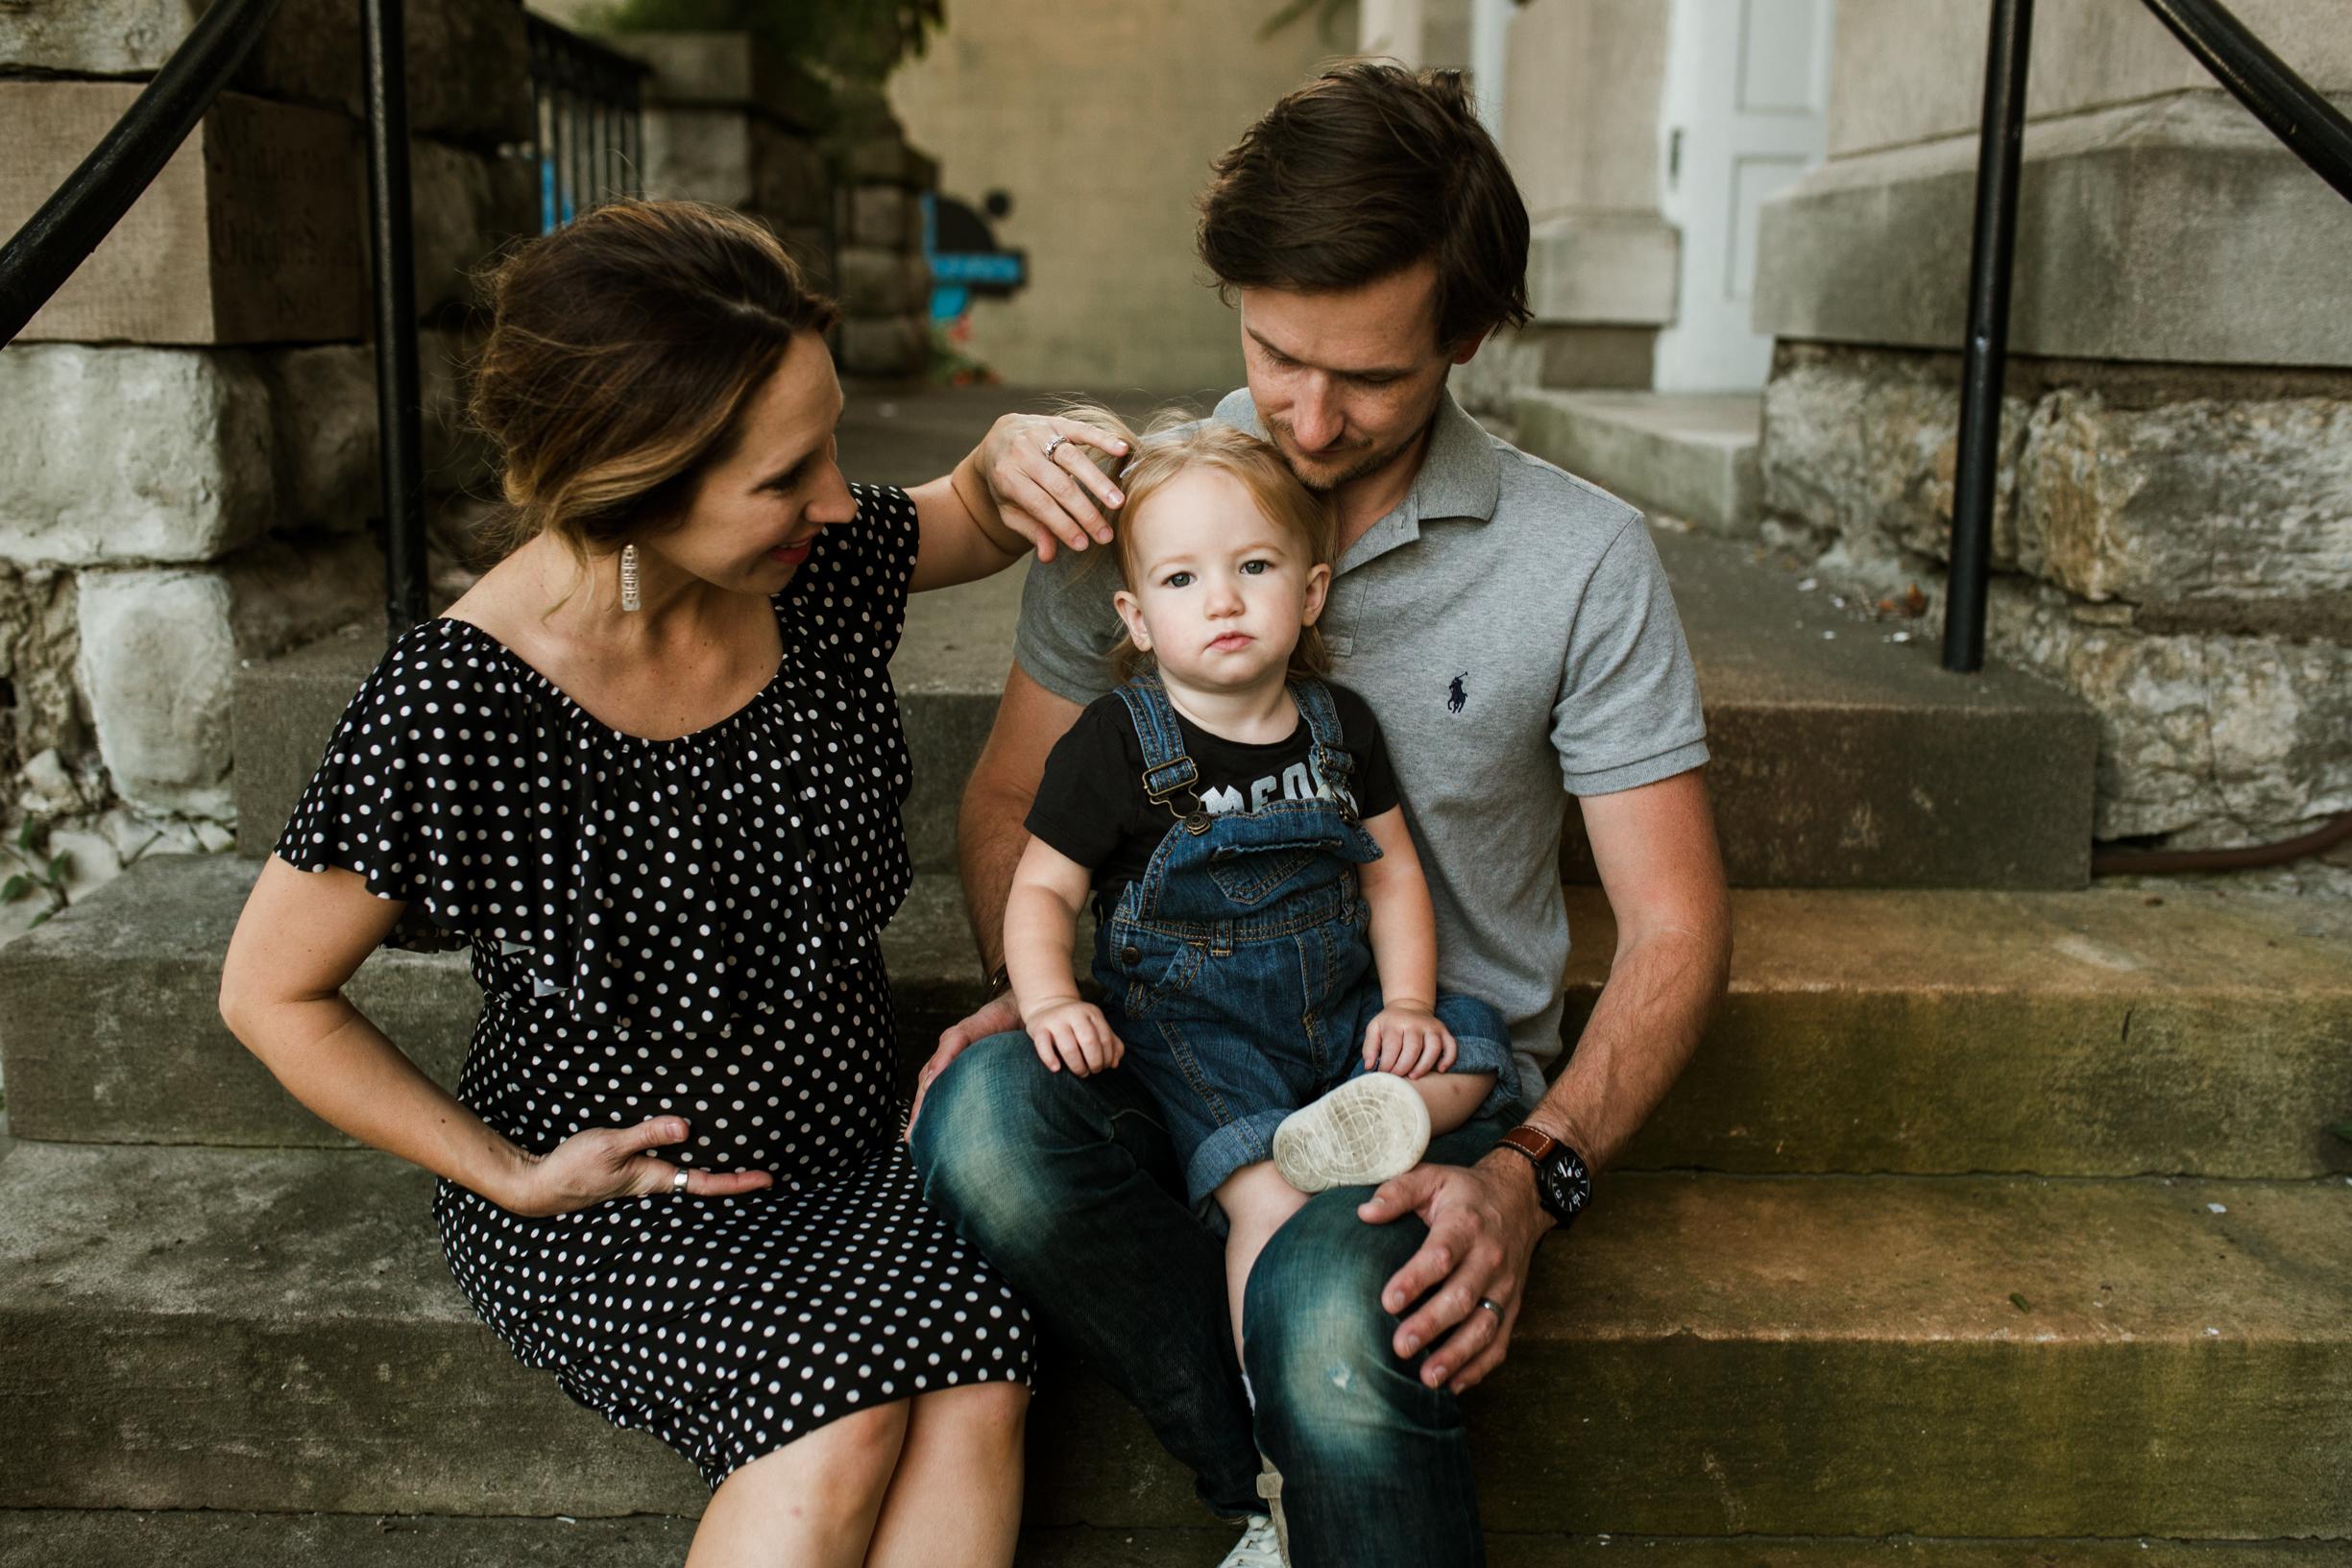 Disney Family 2017 (baby bump) WEBSITE Crystal Ludwick Photo (54 of 68).jpg